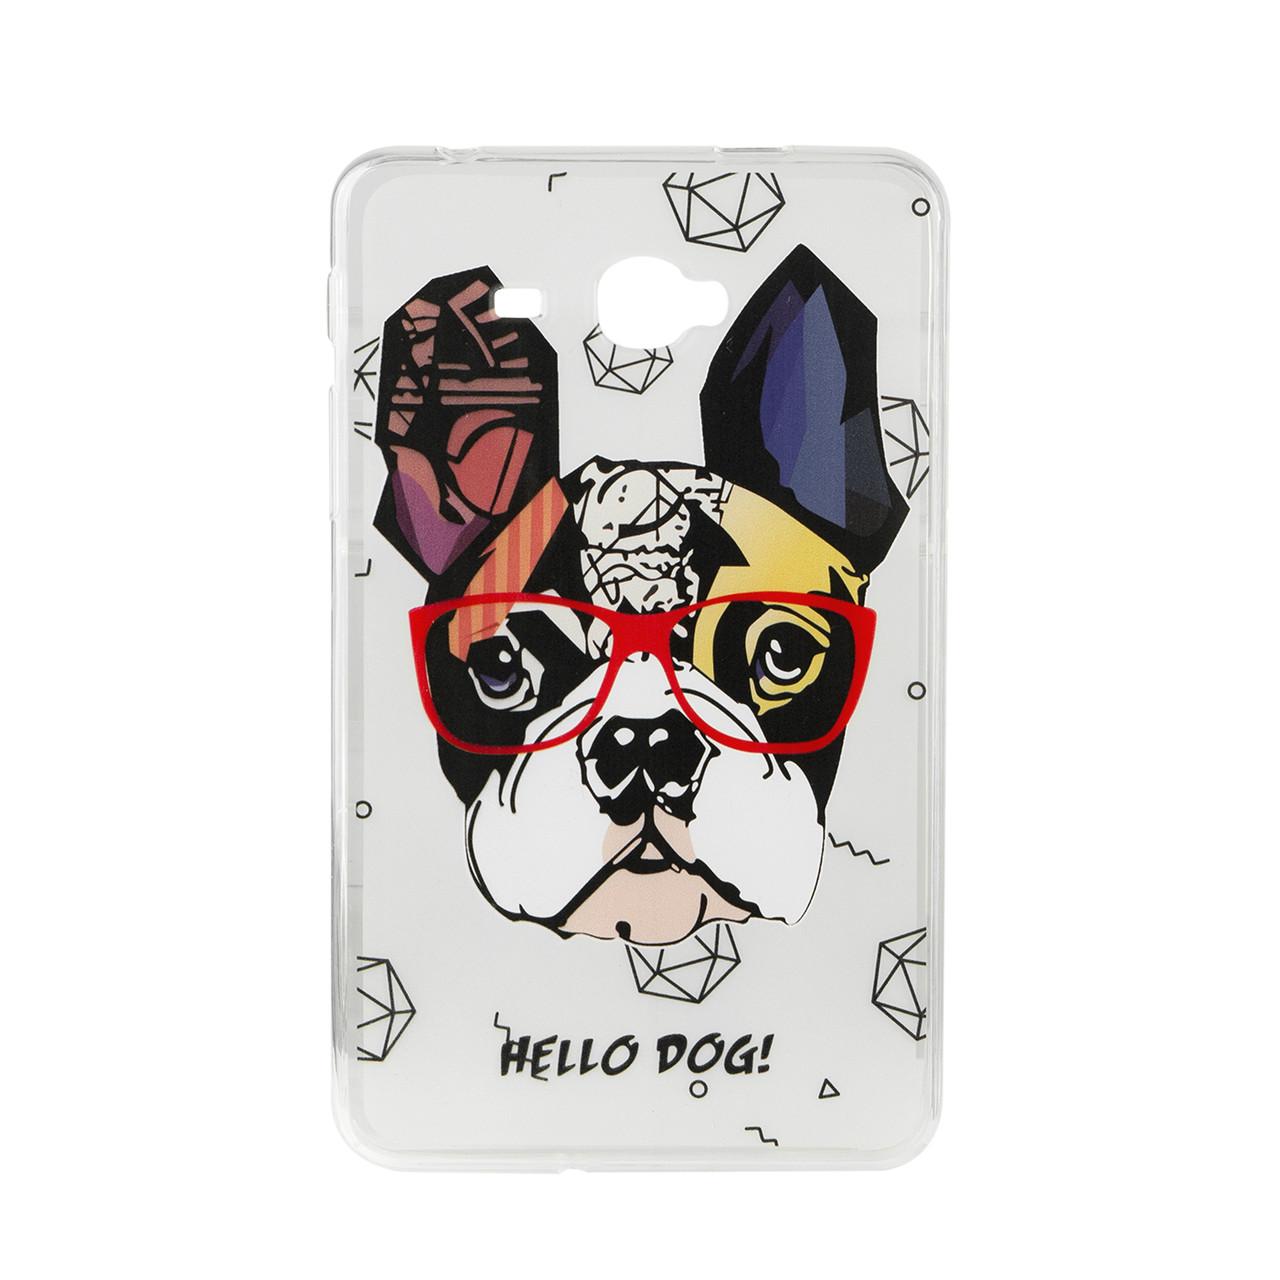 Чехол для Samsung Galaxy Tab A 7.0 SM-T285 back cover TPU Hu Ang Hello Dog, Clear